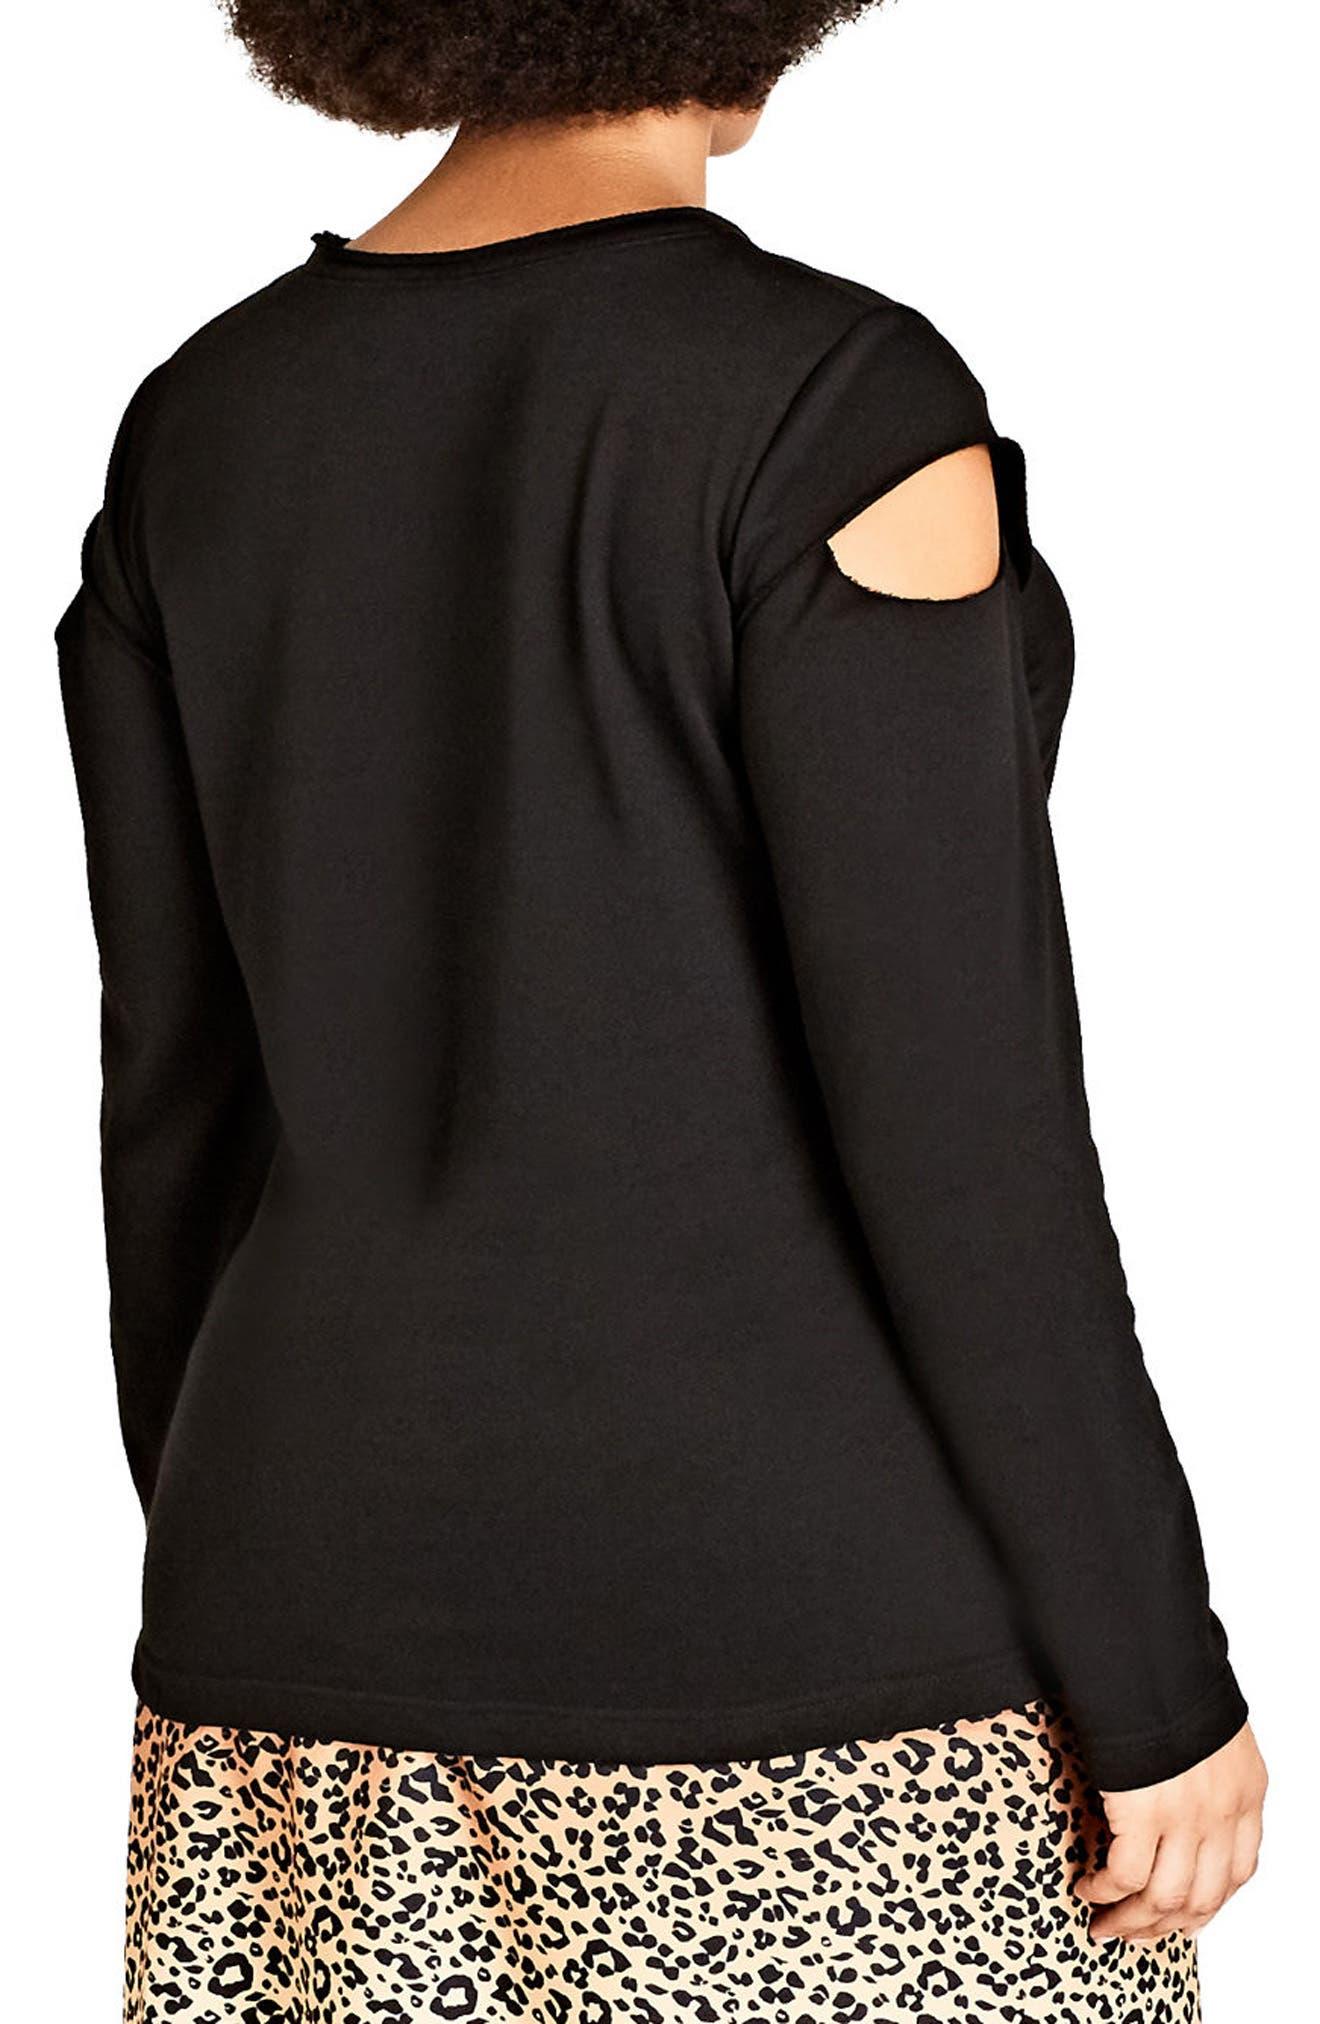 Street Vibe Sweatshirt,                             Alternate thumbnail 2, color,